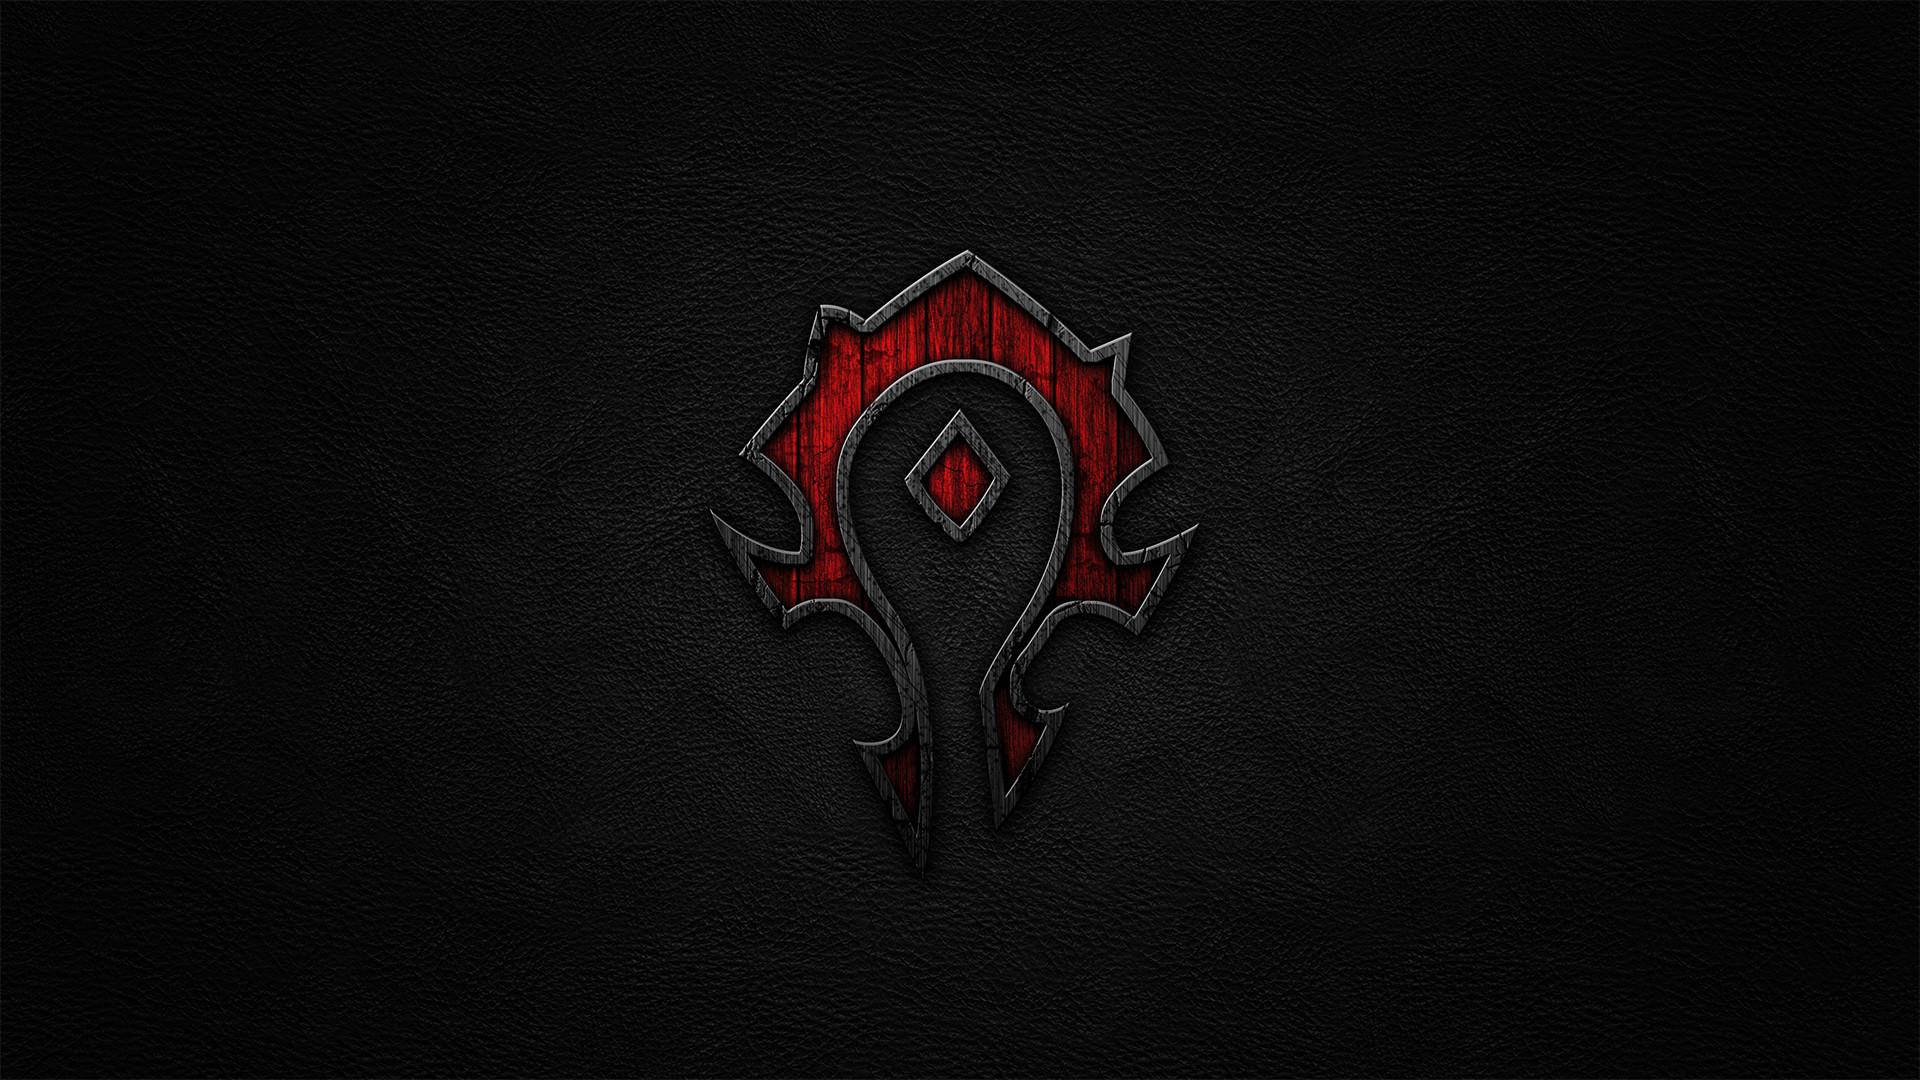 horde logo wallpaper 183�� wallpapertag